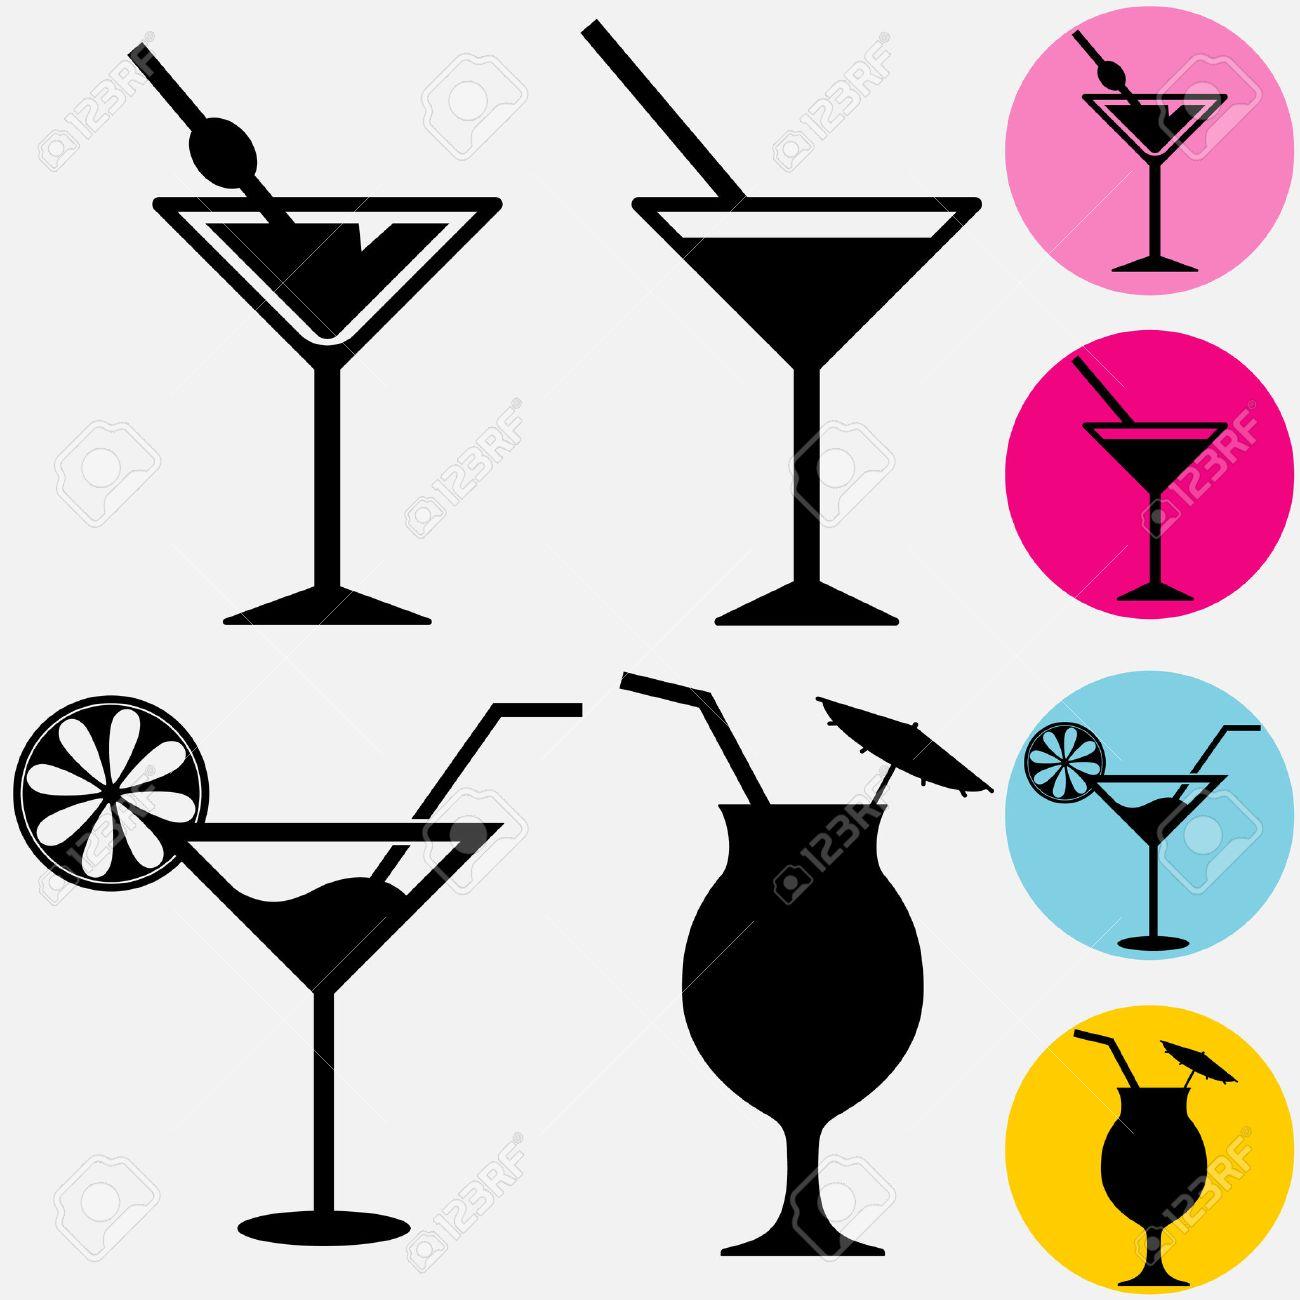 68 863 cocktail glass stock vector illustration and royalty free rh 123rf com Cocktails Clip Art Symbols Retro Cocktail Clip Art